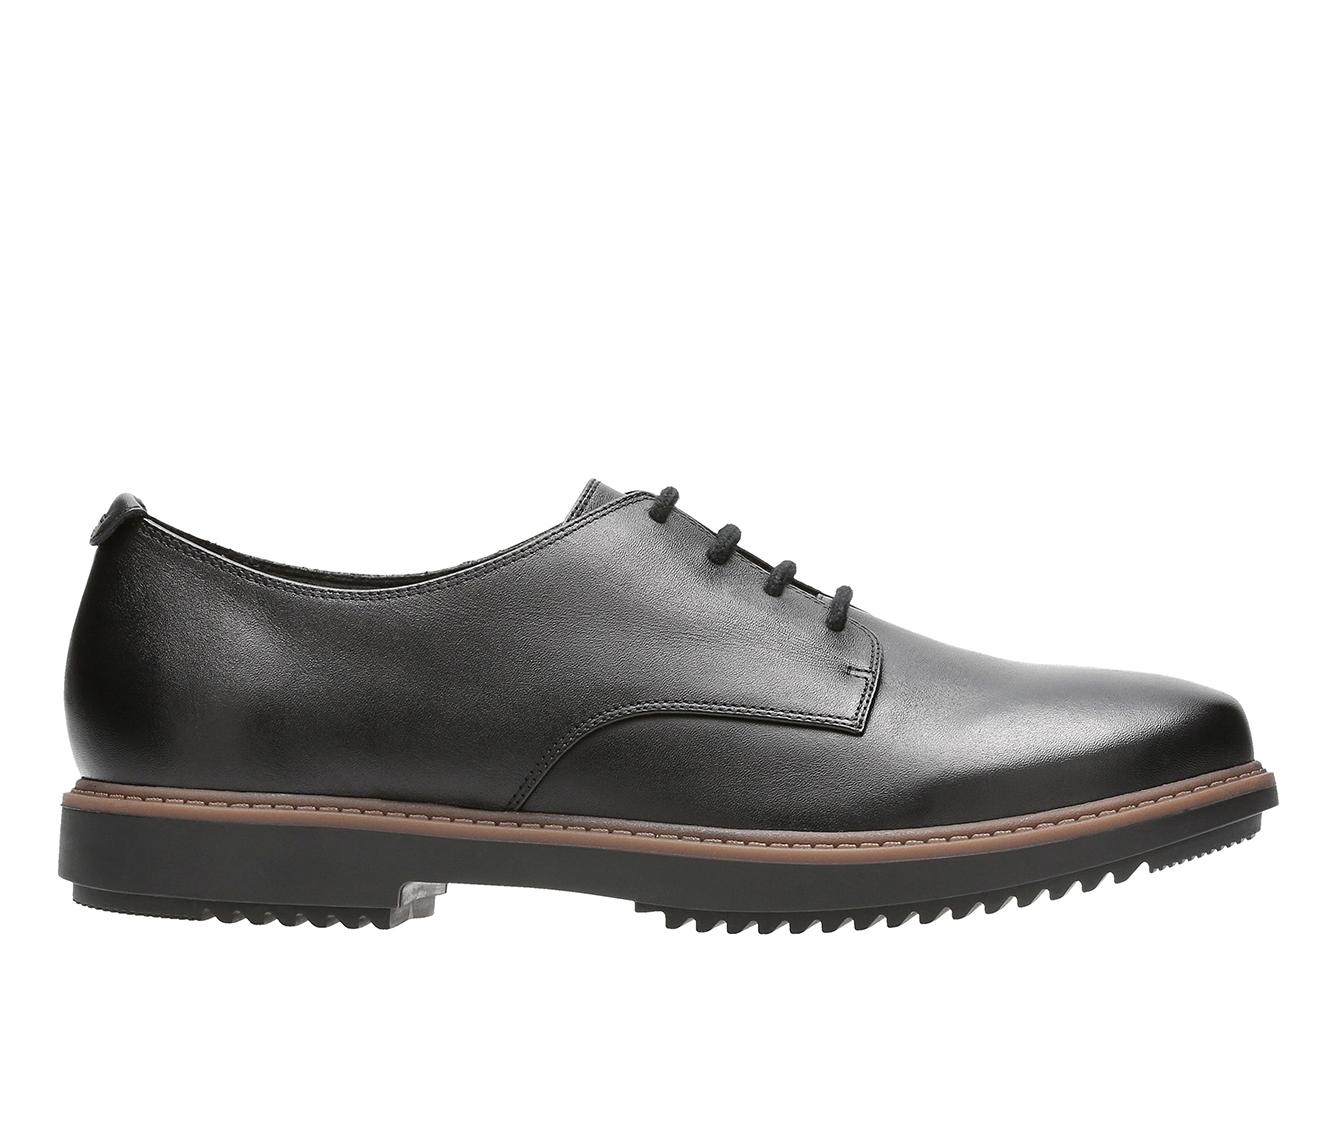 Clarks Raisie Bloom Women's Shoe (Black Leather)